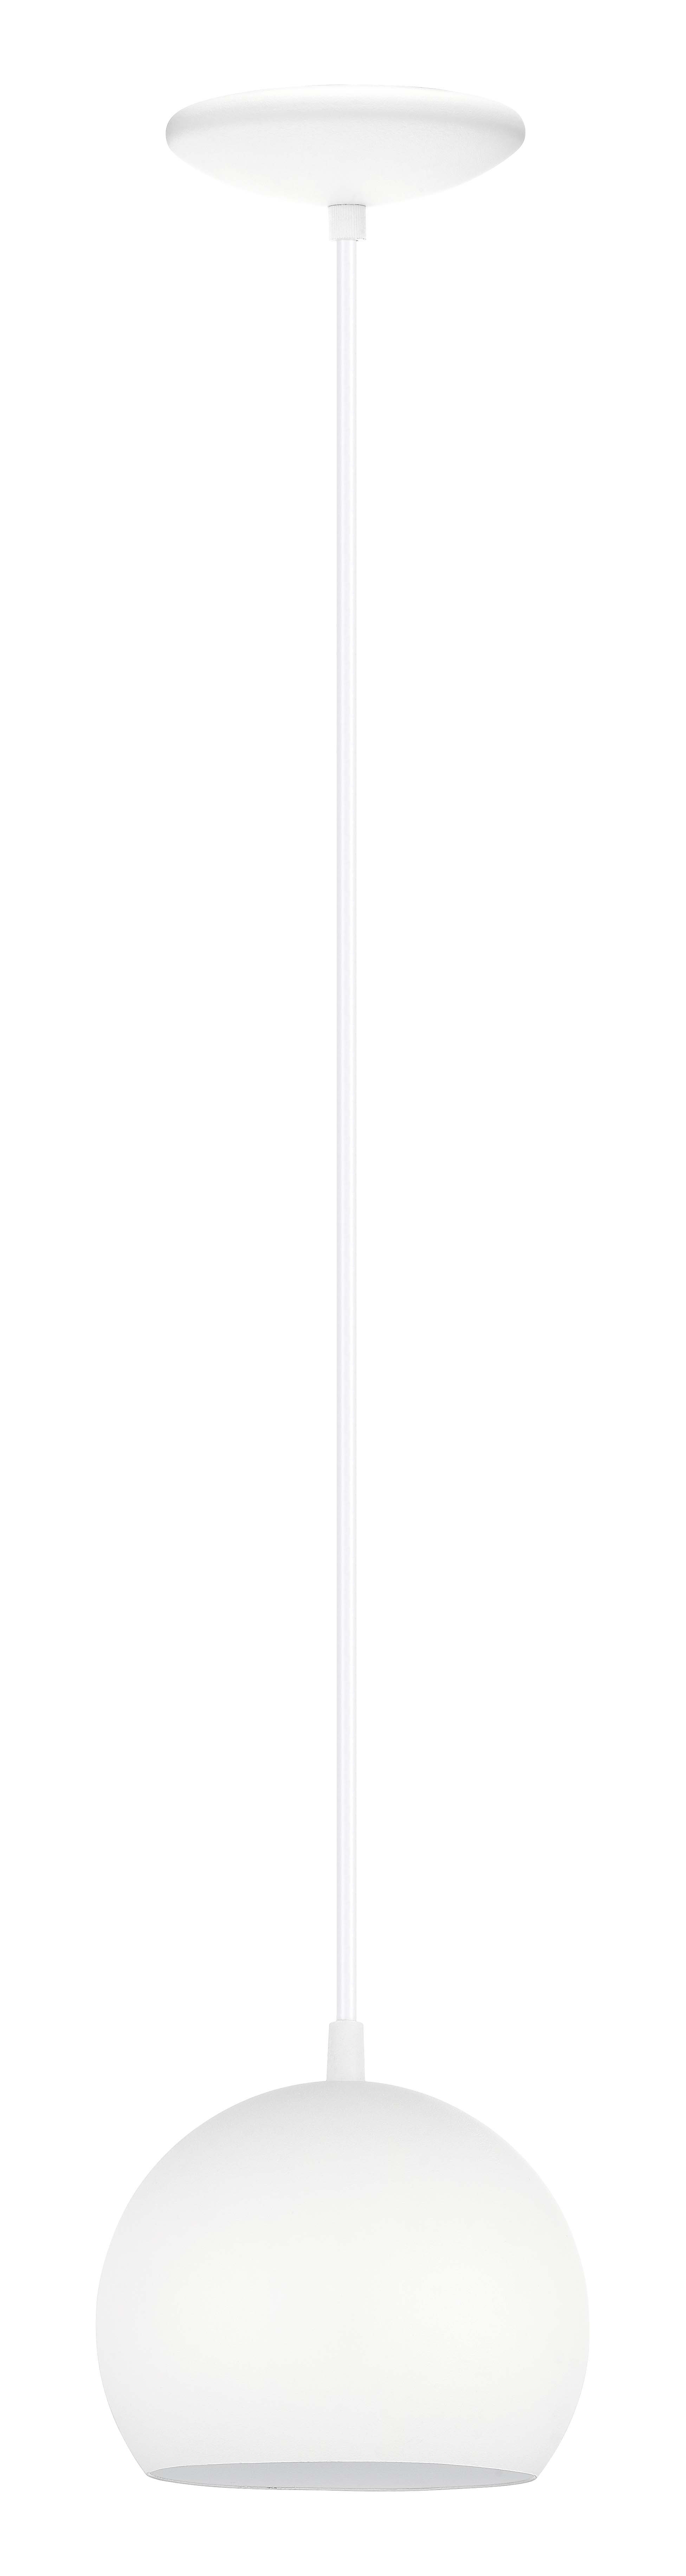 Creola 1-Light Single Globe Pendant throughout Bautista 1-Light Single Globe Pendants (Image 20 of 30)